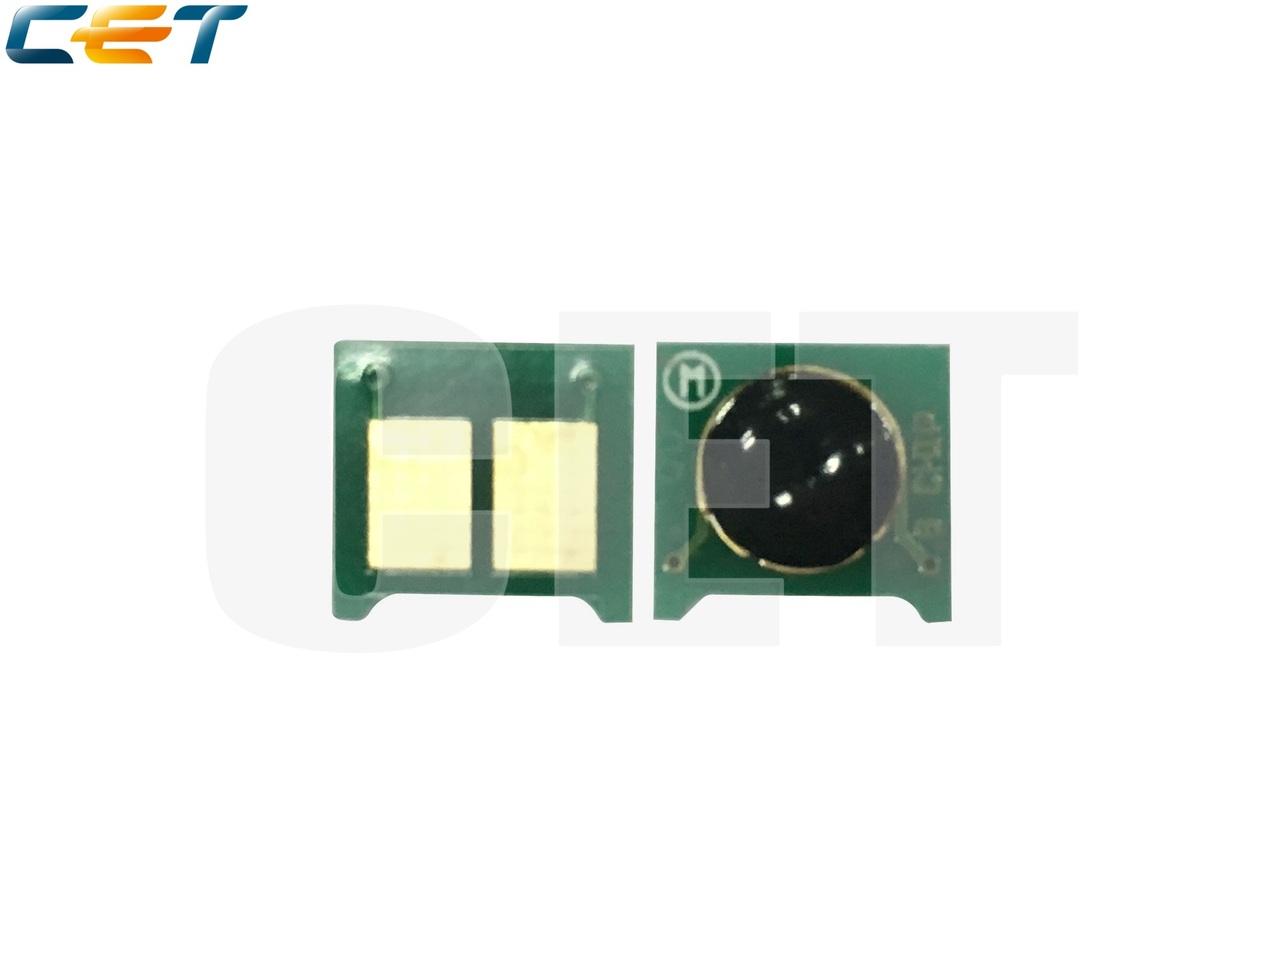 Чип драм-юнита CE314A для HP Color LaserJet Pro CP1025,M175/176 (CET), (WW), 14K/7K, CET0909